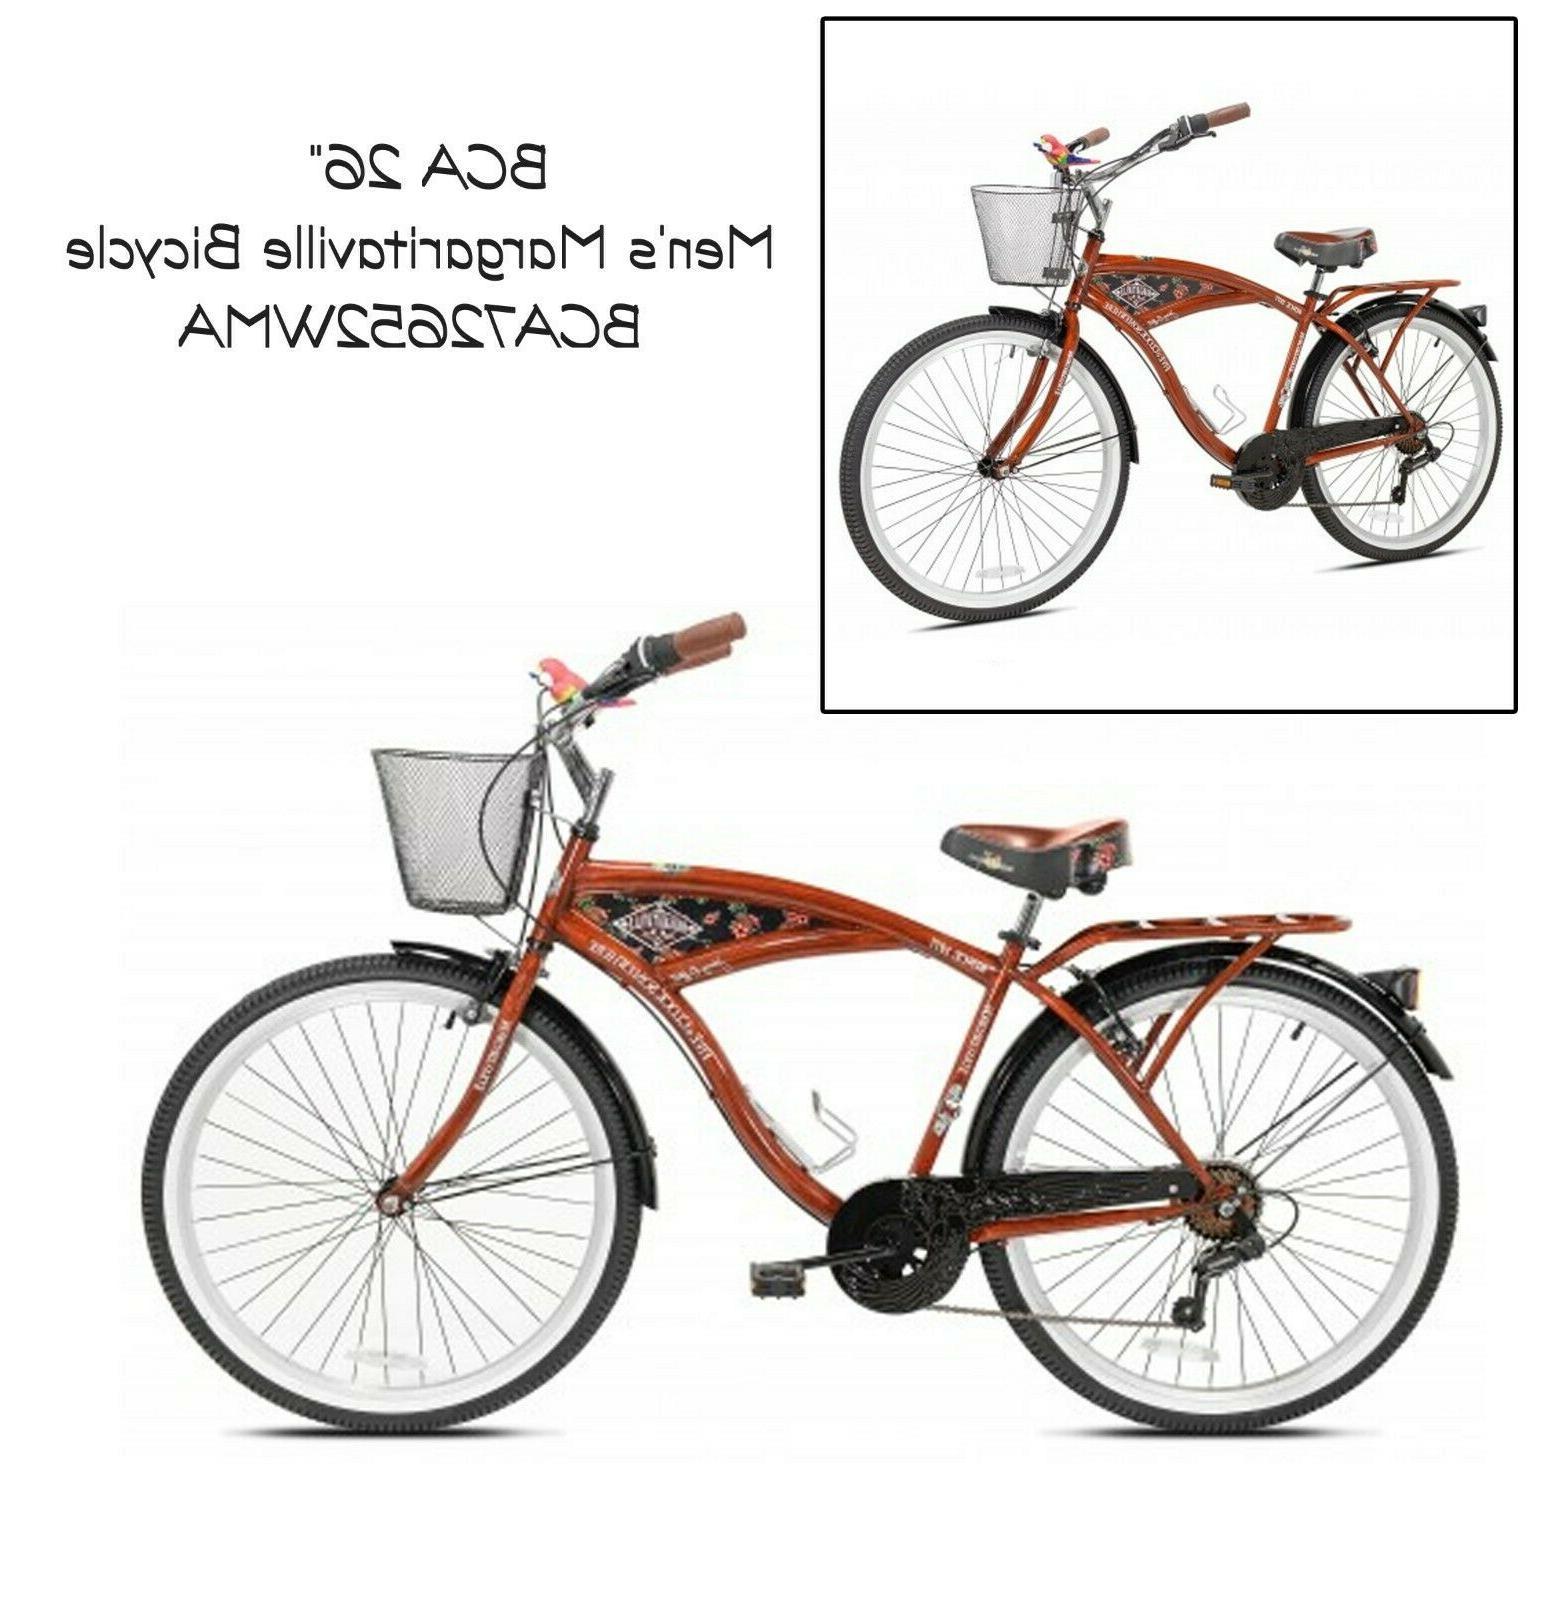 26 mens multi speed cruiser bike basket